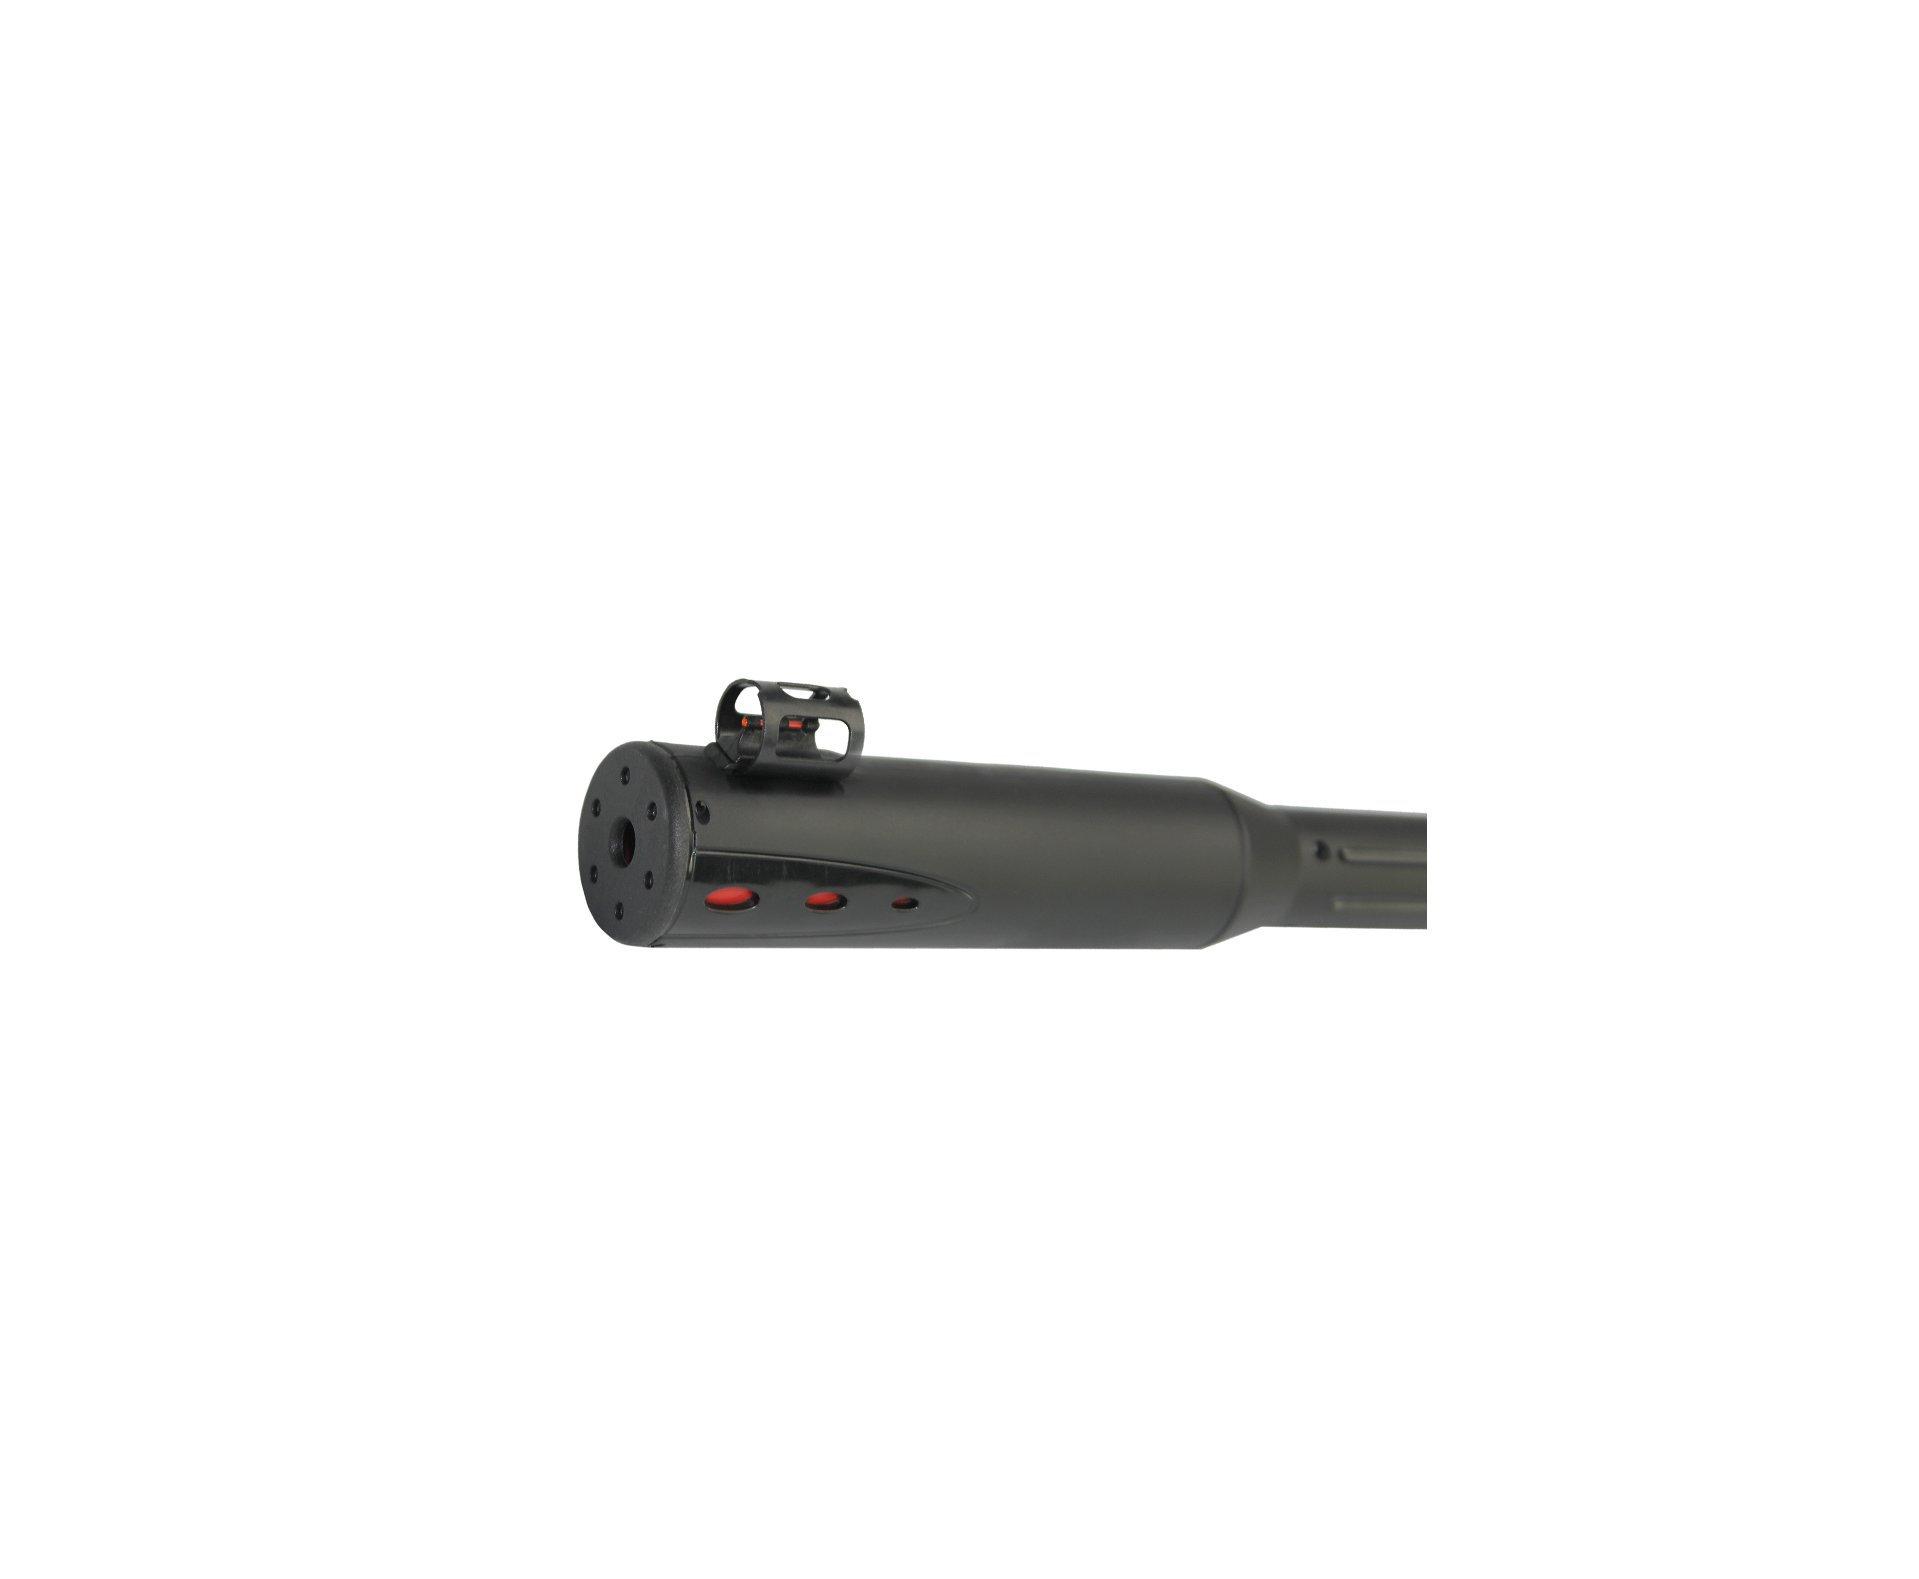 Carabina De Pressão Gamo Whisper Fusion Igt 5,5mm